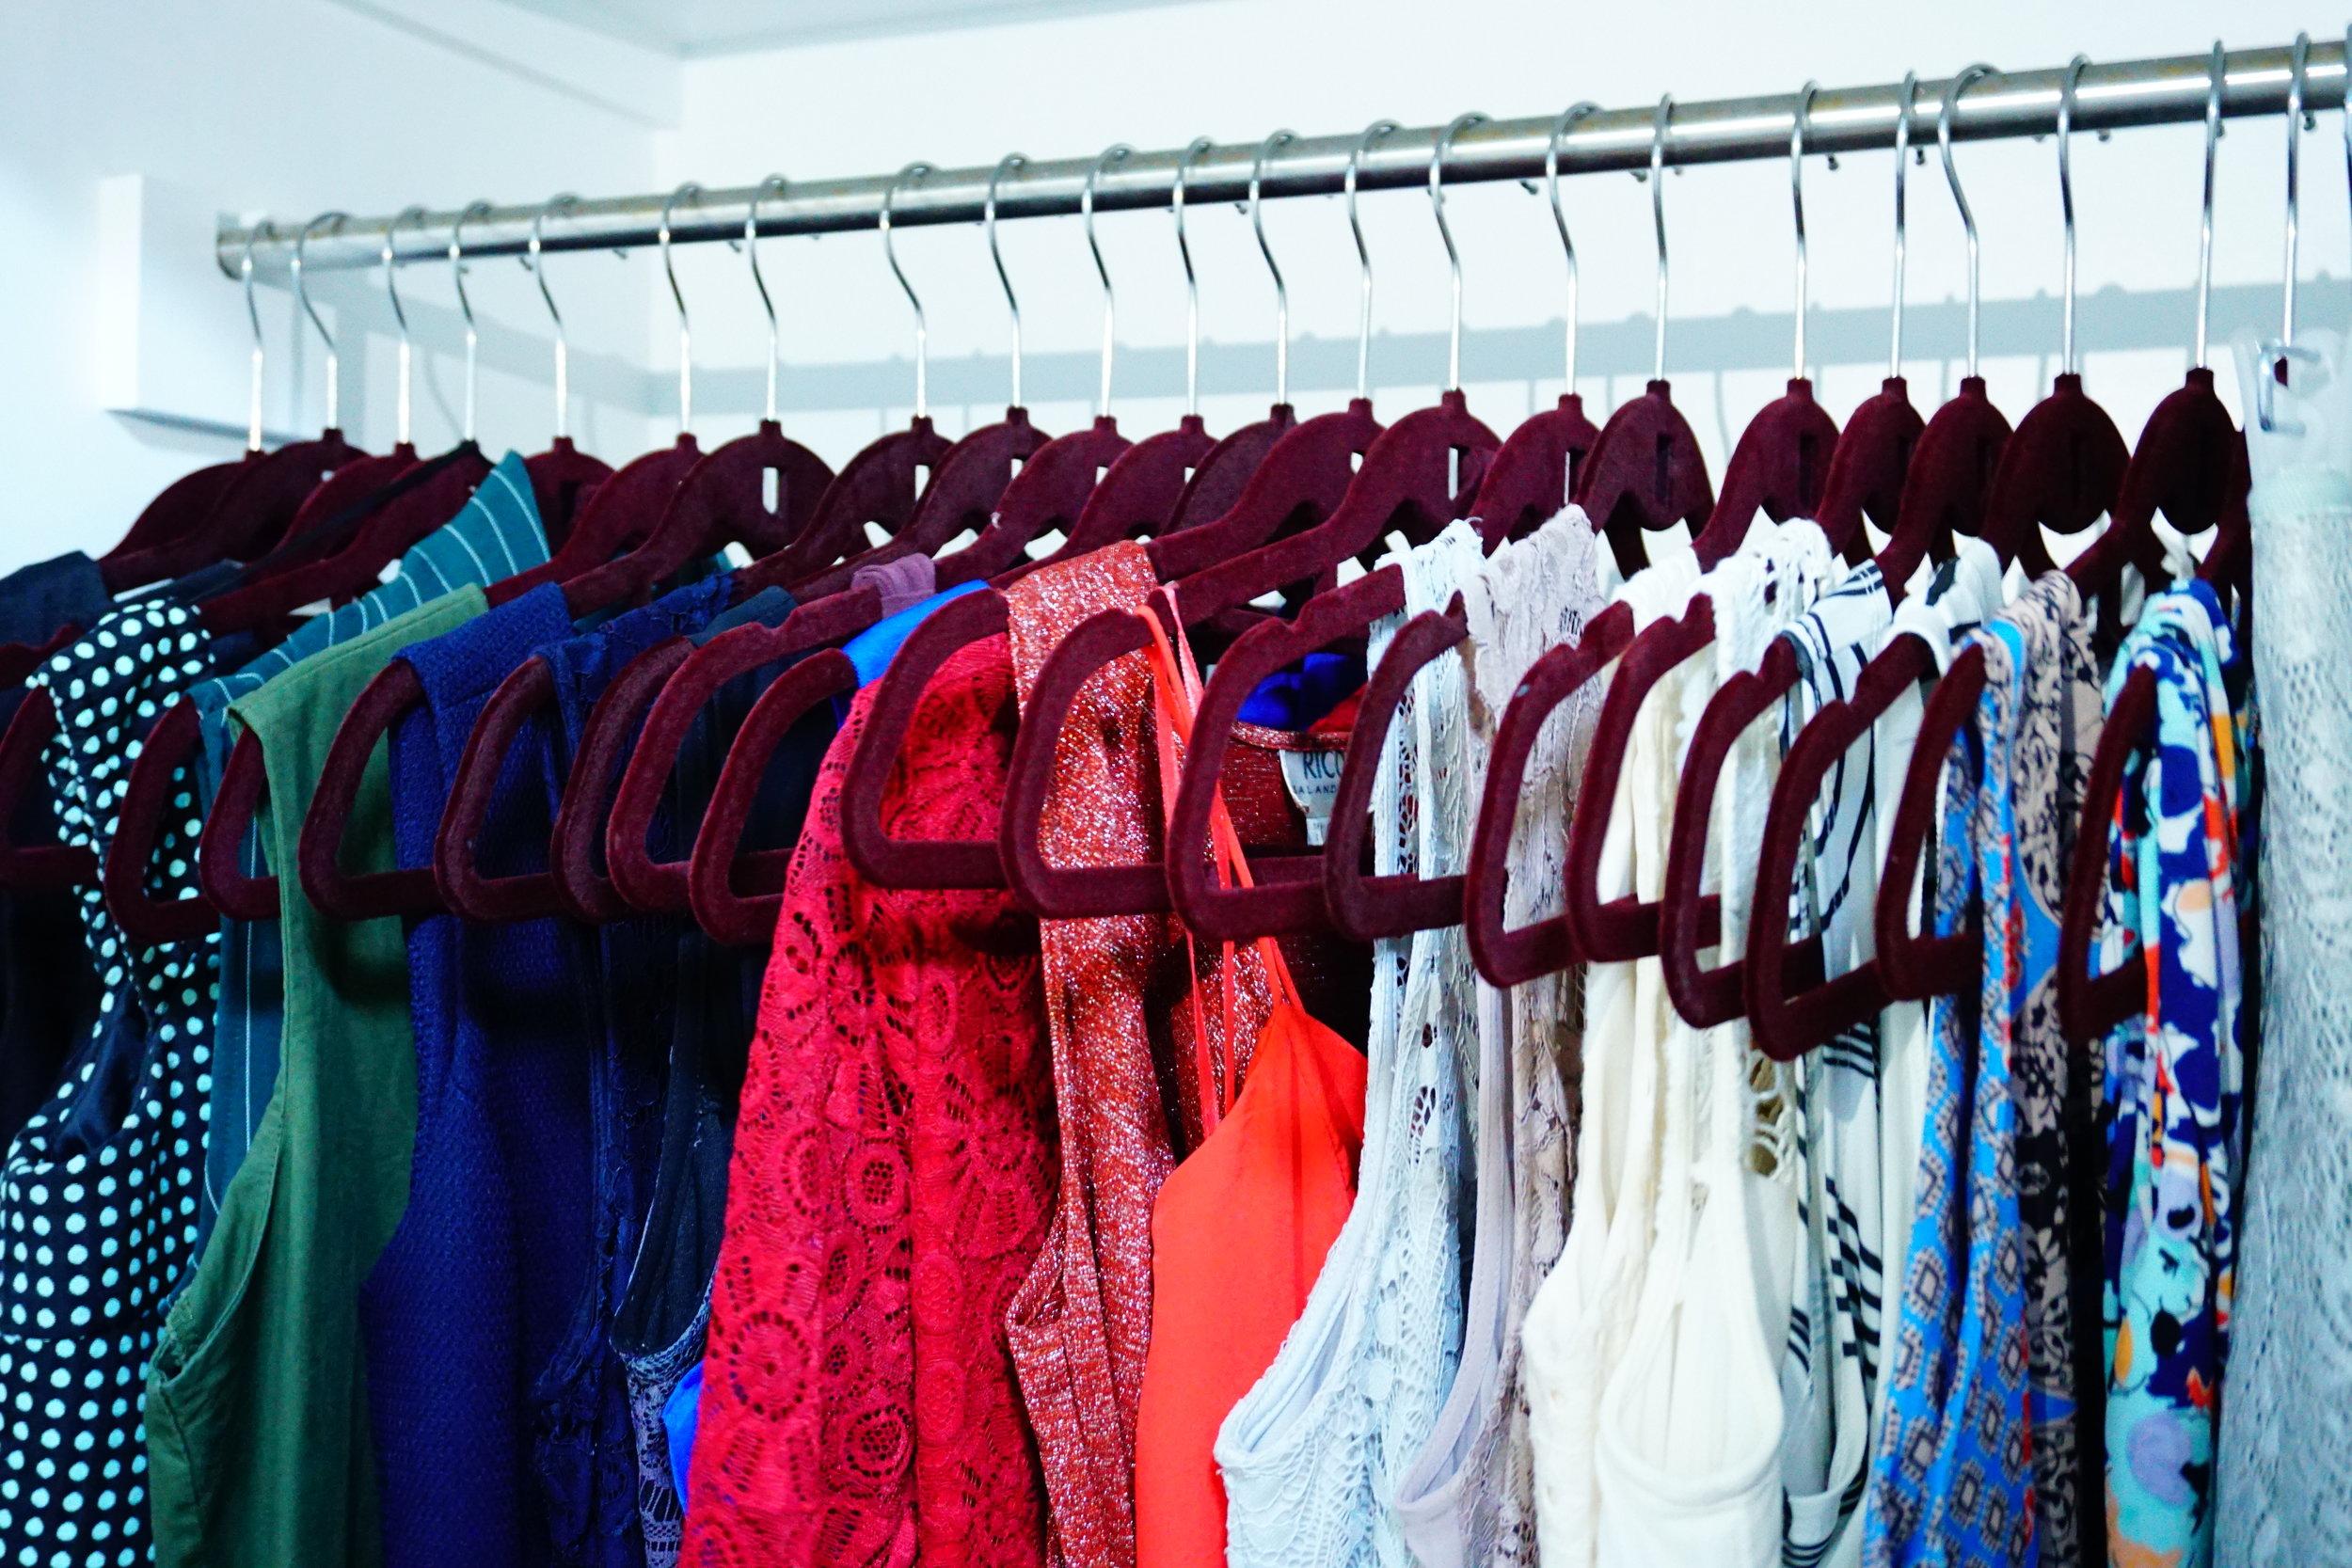 My Closet tour - The story of my closet transformation